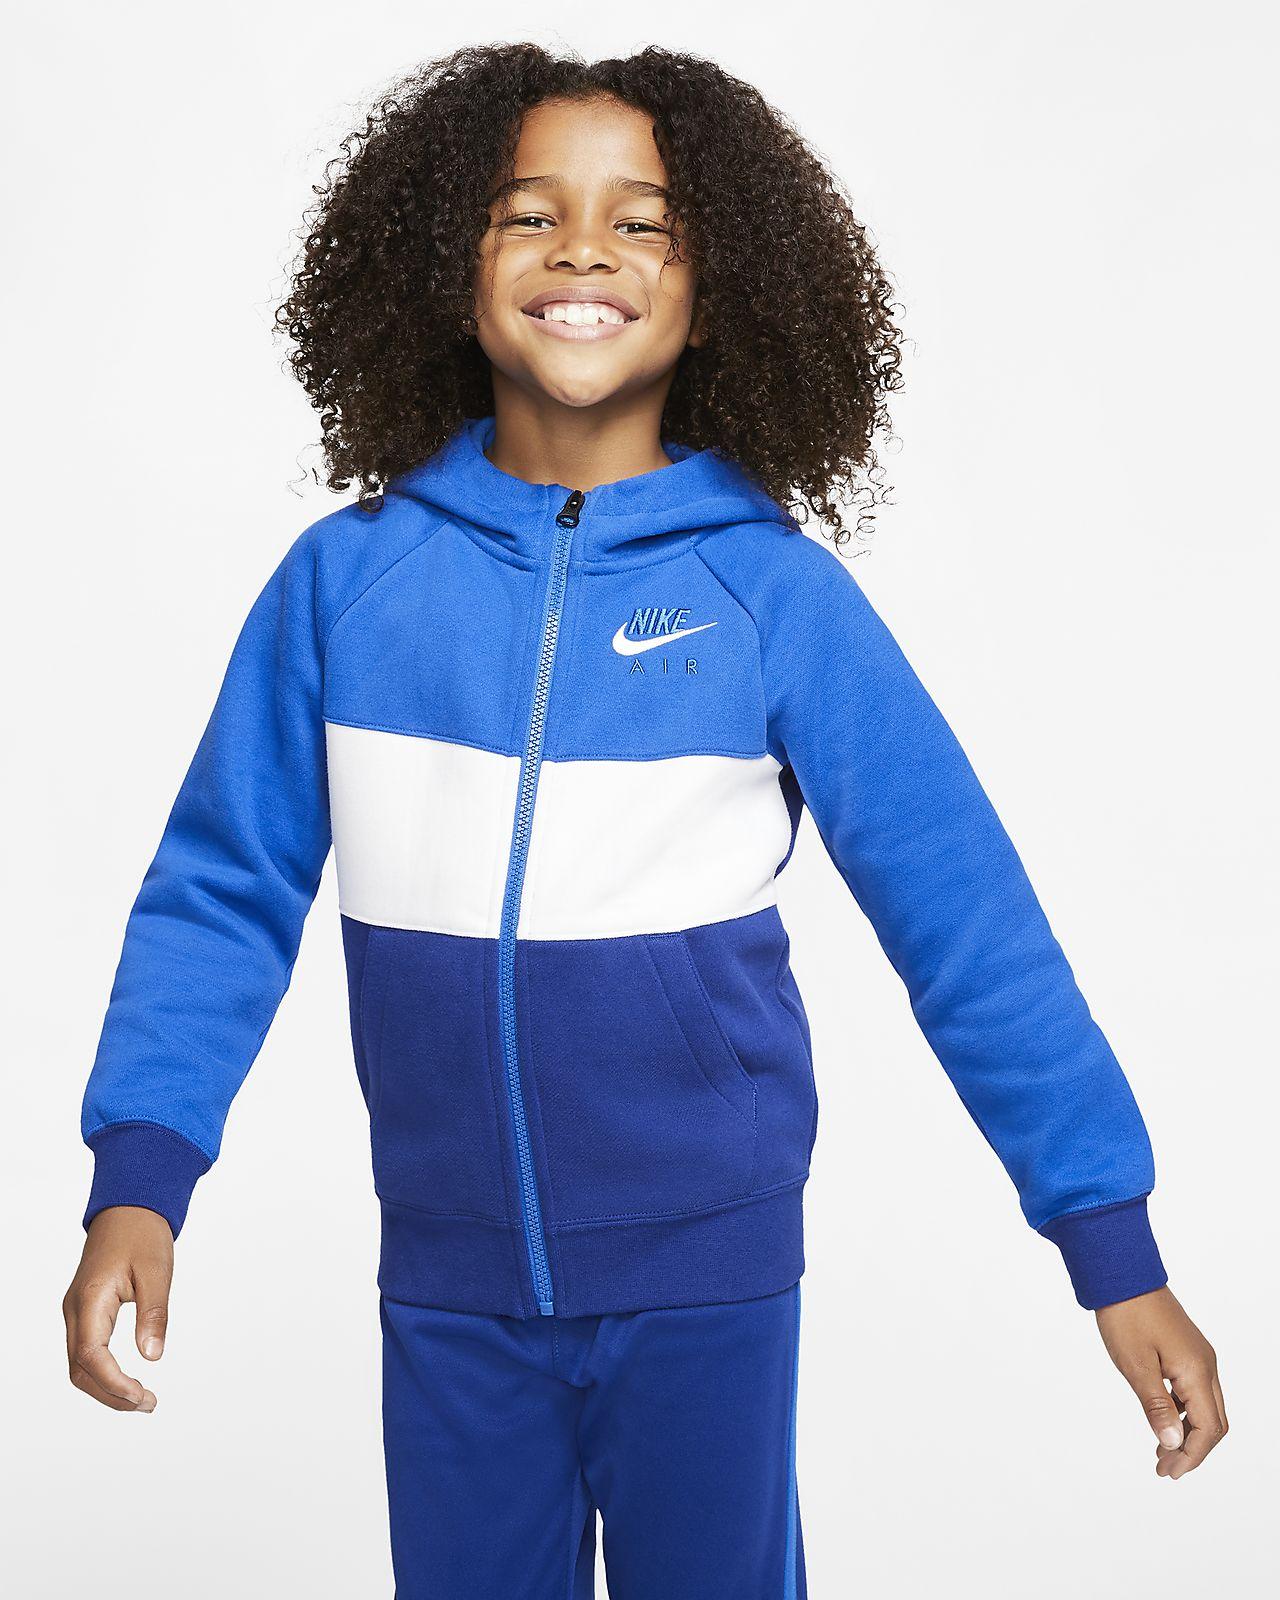 Nike Sportswear 幼童全长拉链开襟连帽衫